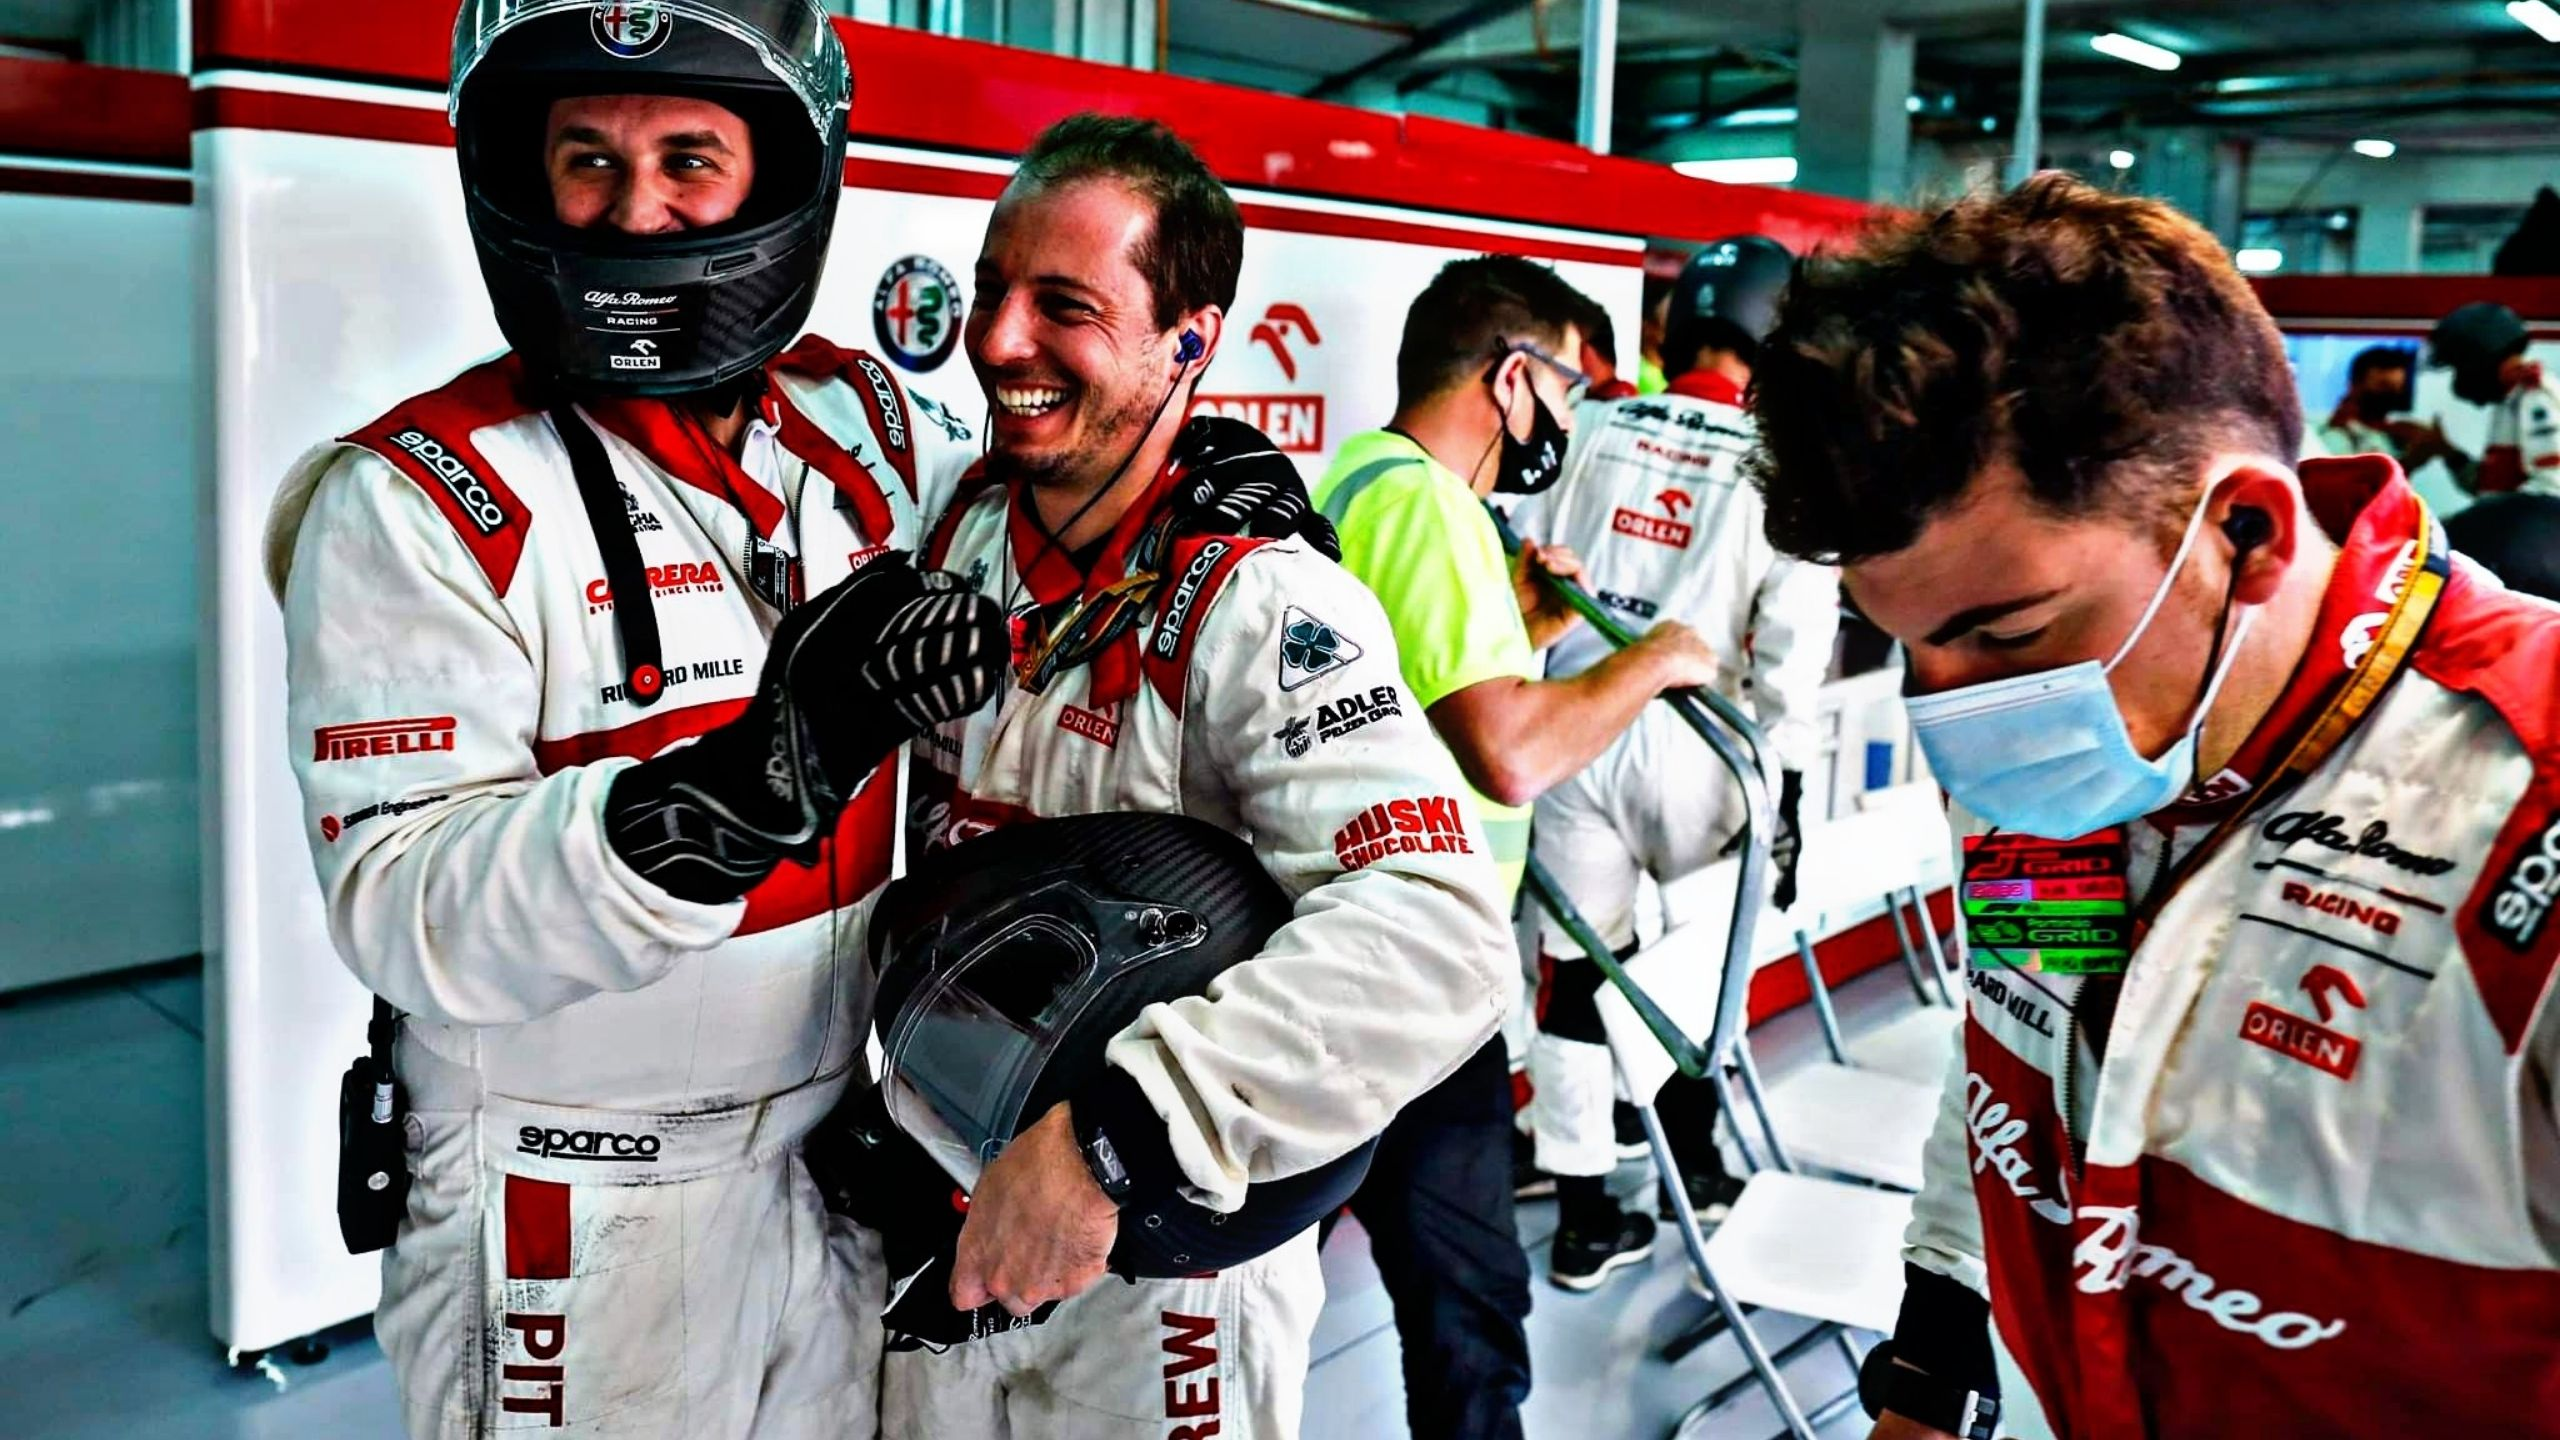 Antonio Giovinazzi: Alfa Romeo driver reveals watching F4, Formula Renault videos of Imola helped him overtake 6 drivers on opening lap